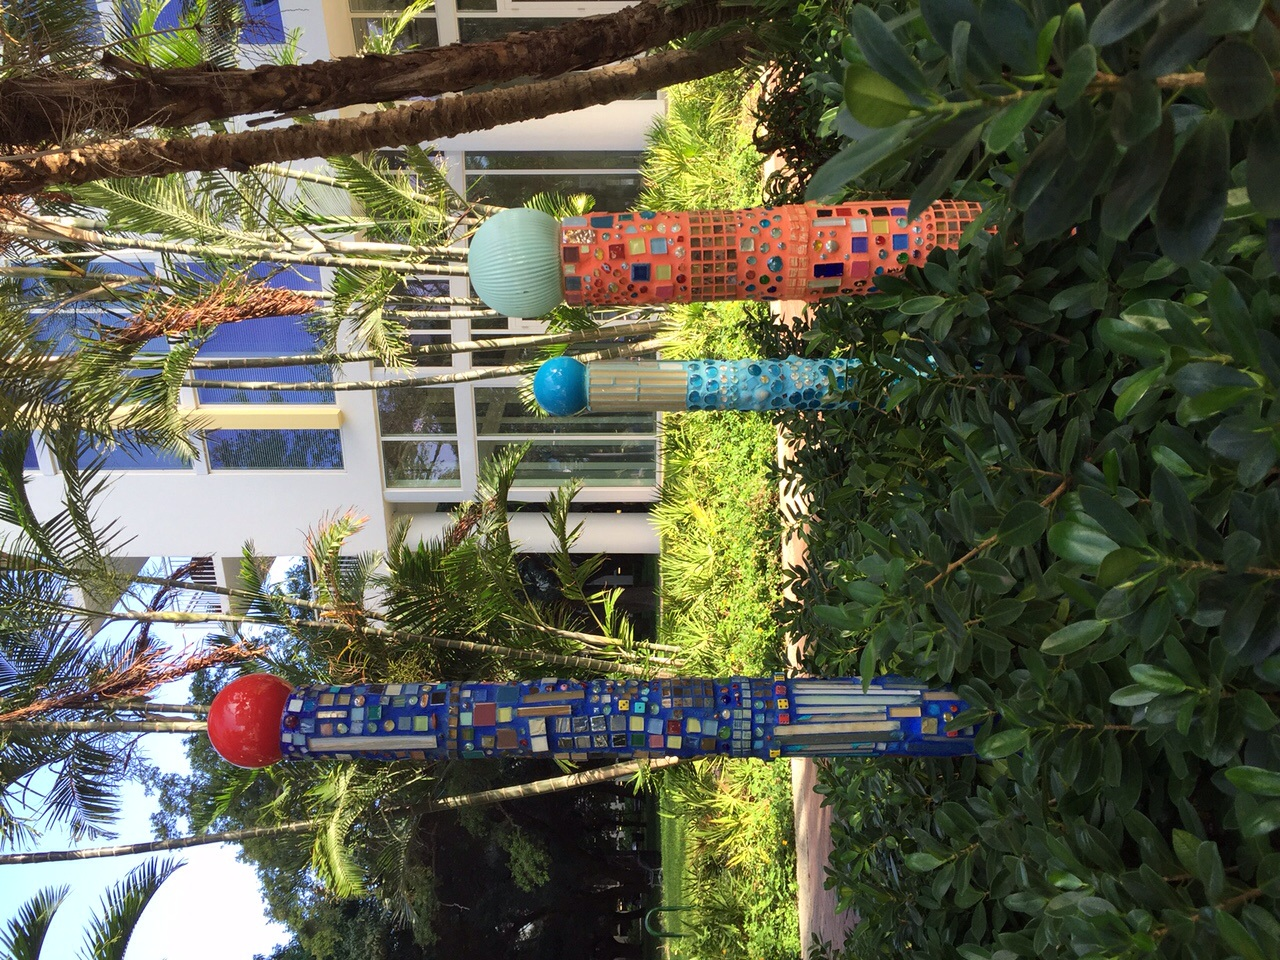 Mosaic poles